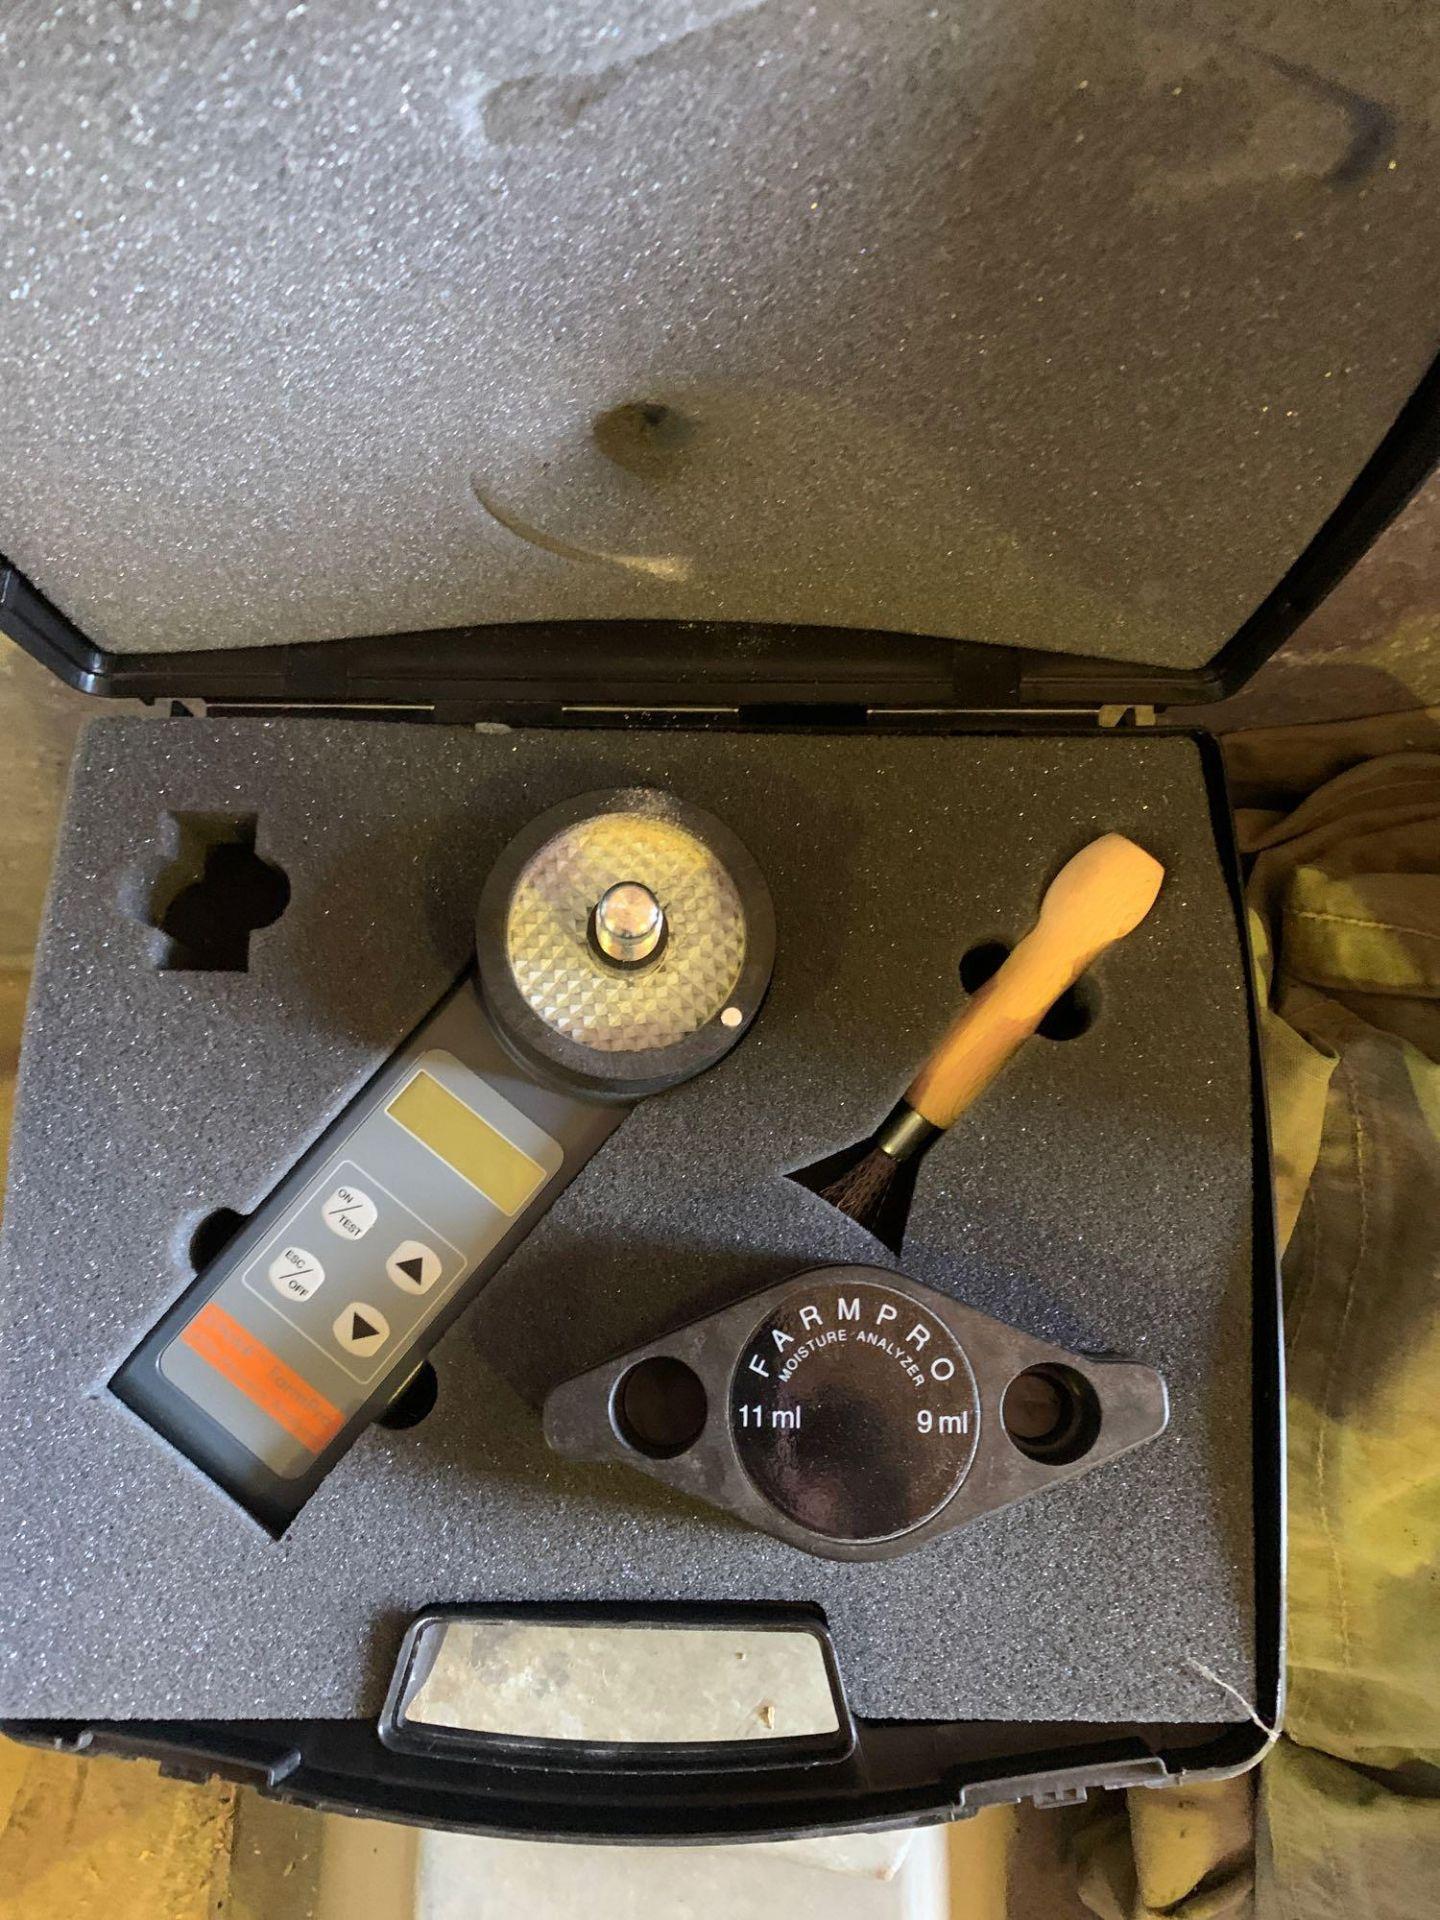 Sinar moisture meter - Image 4 of 4